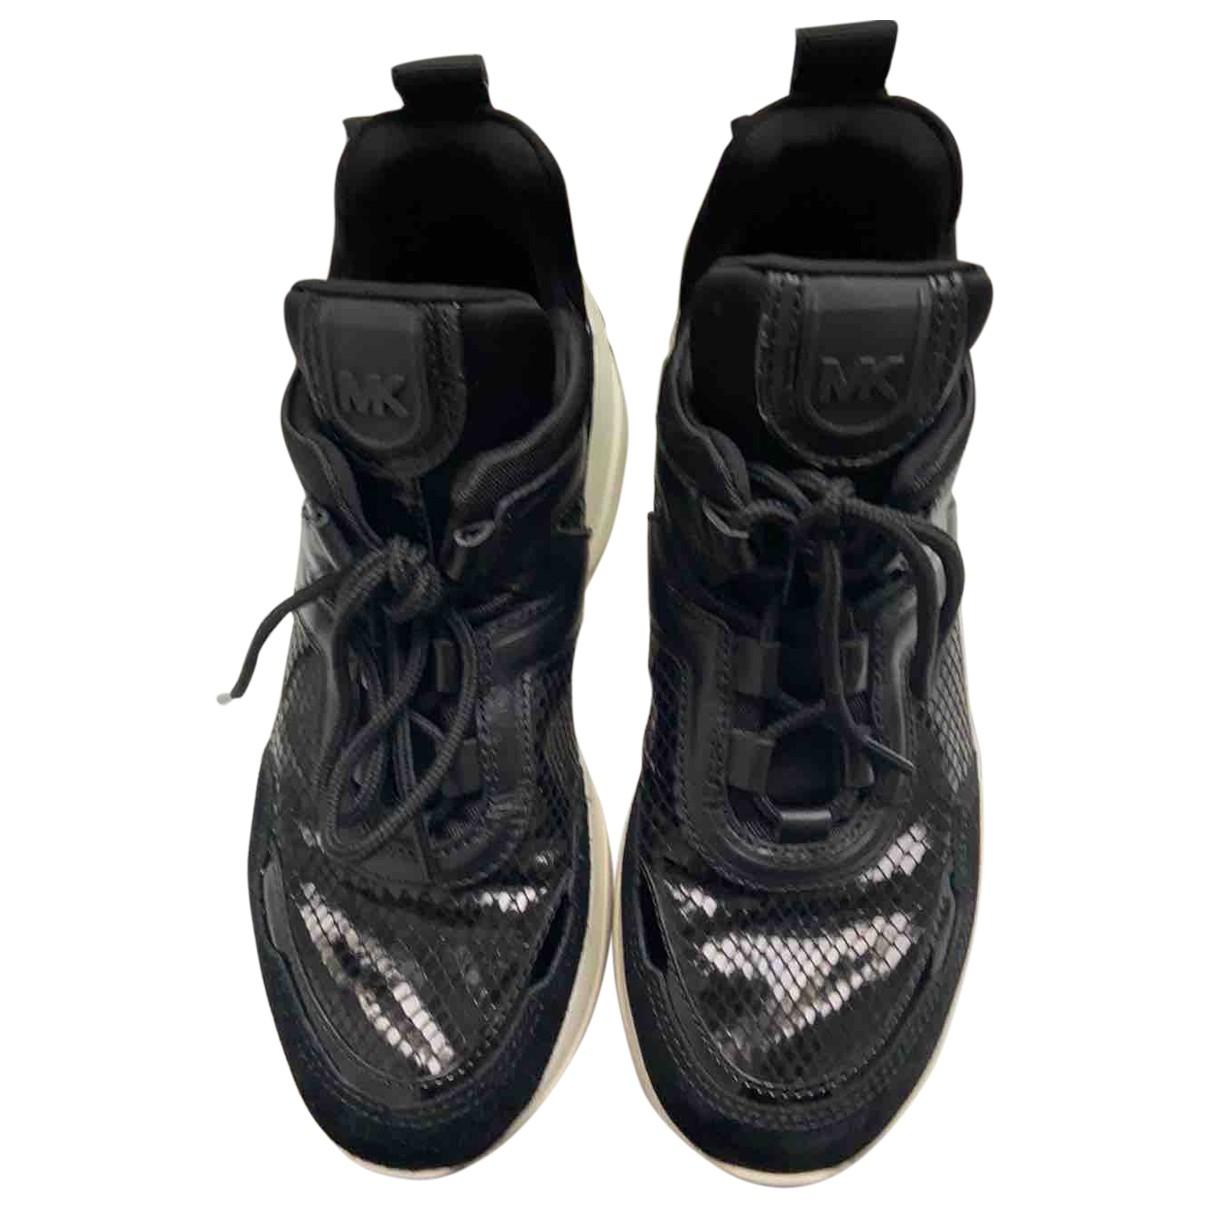 Michael Kors N Black Leather Trainers for Women 36 EU